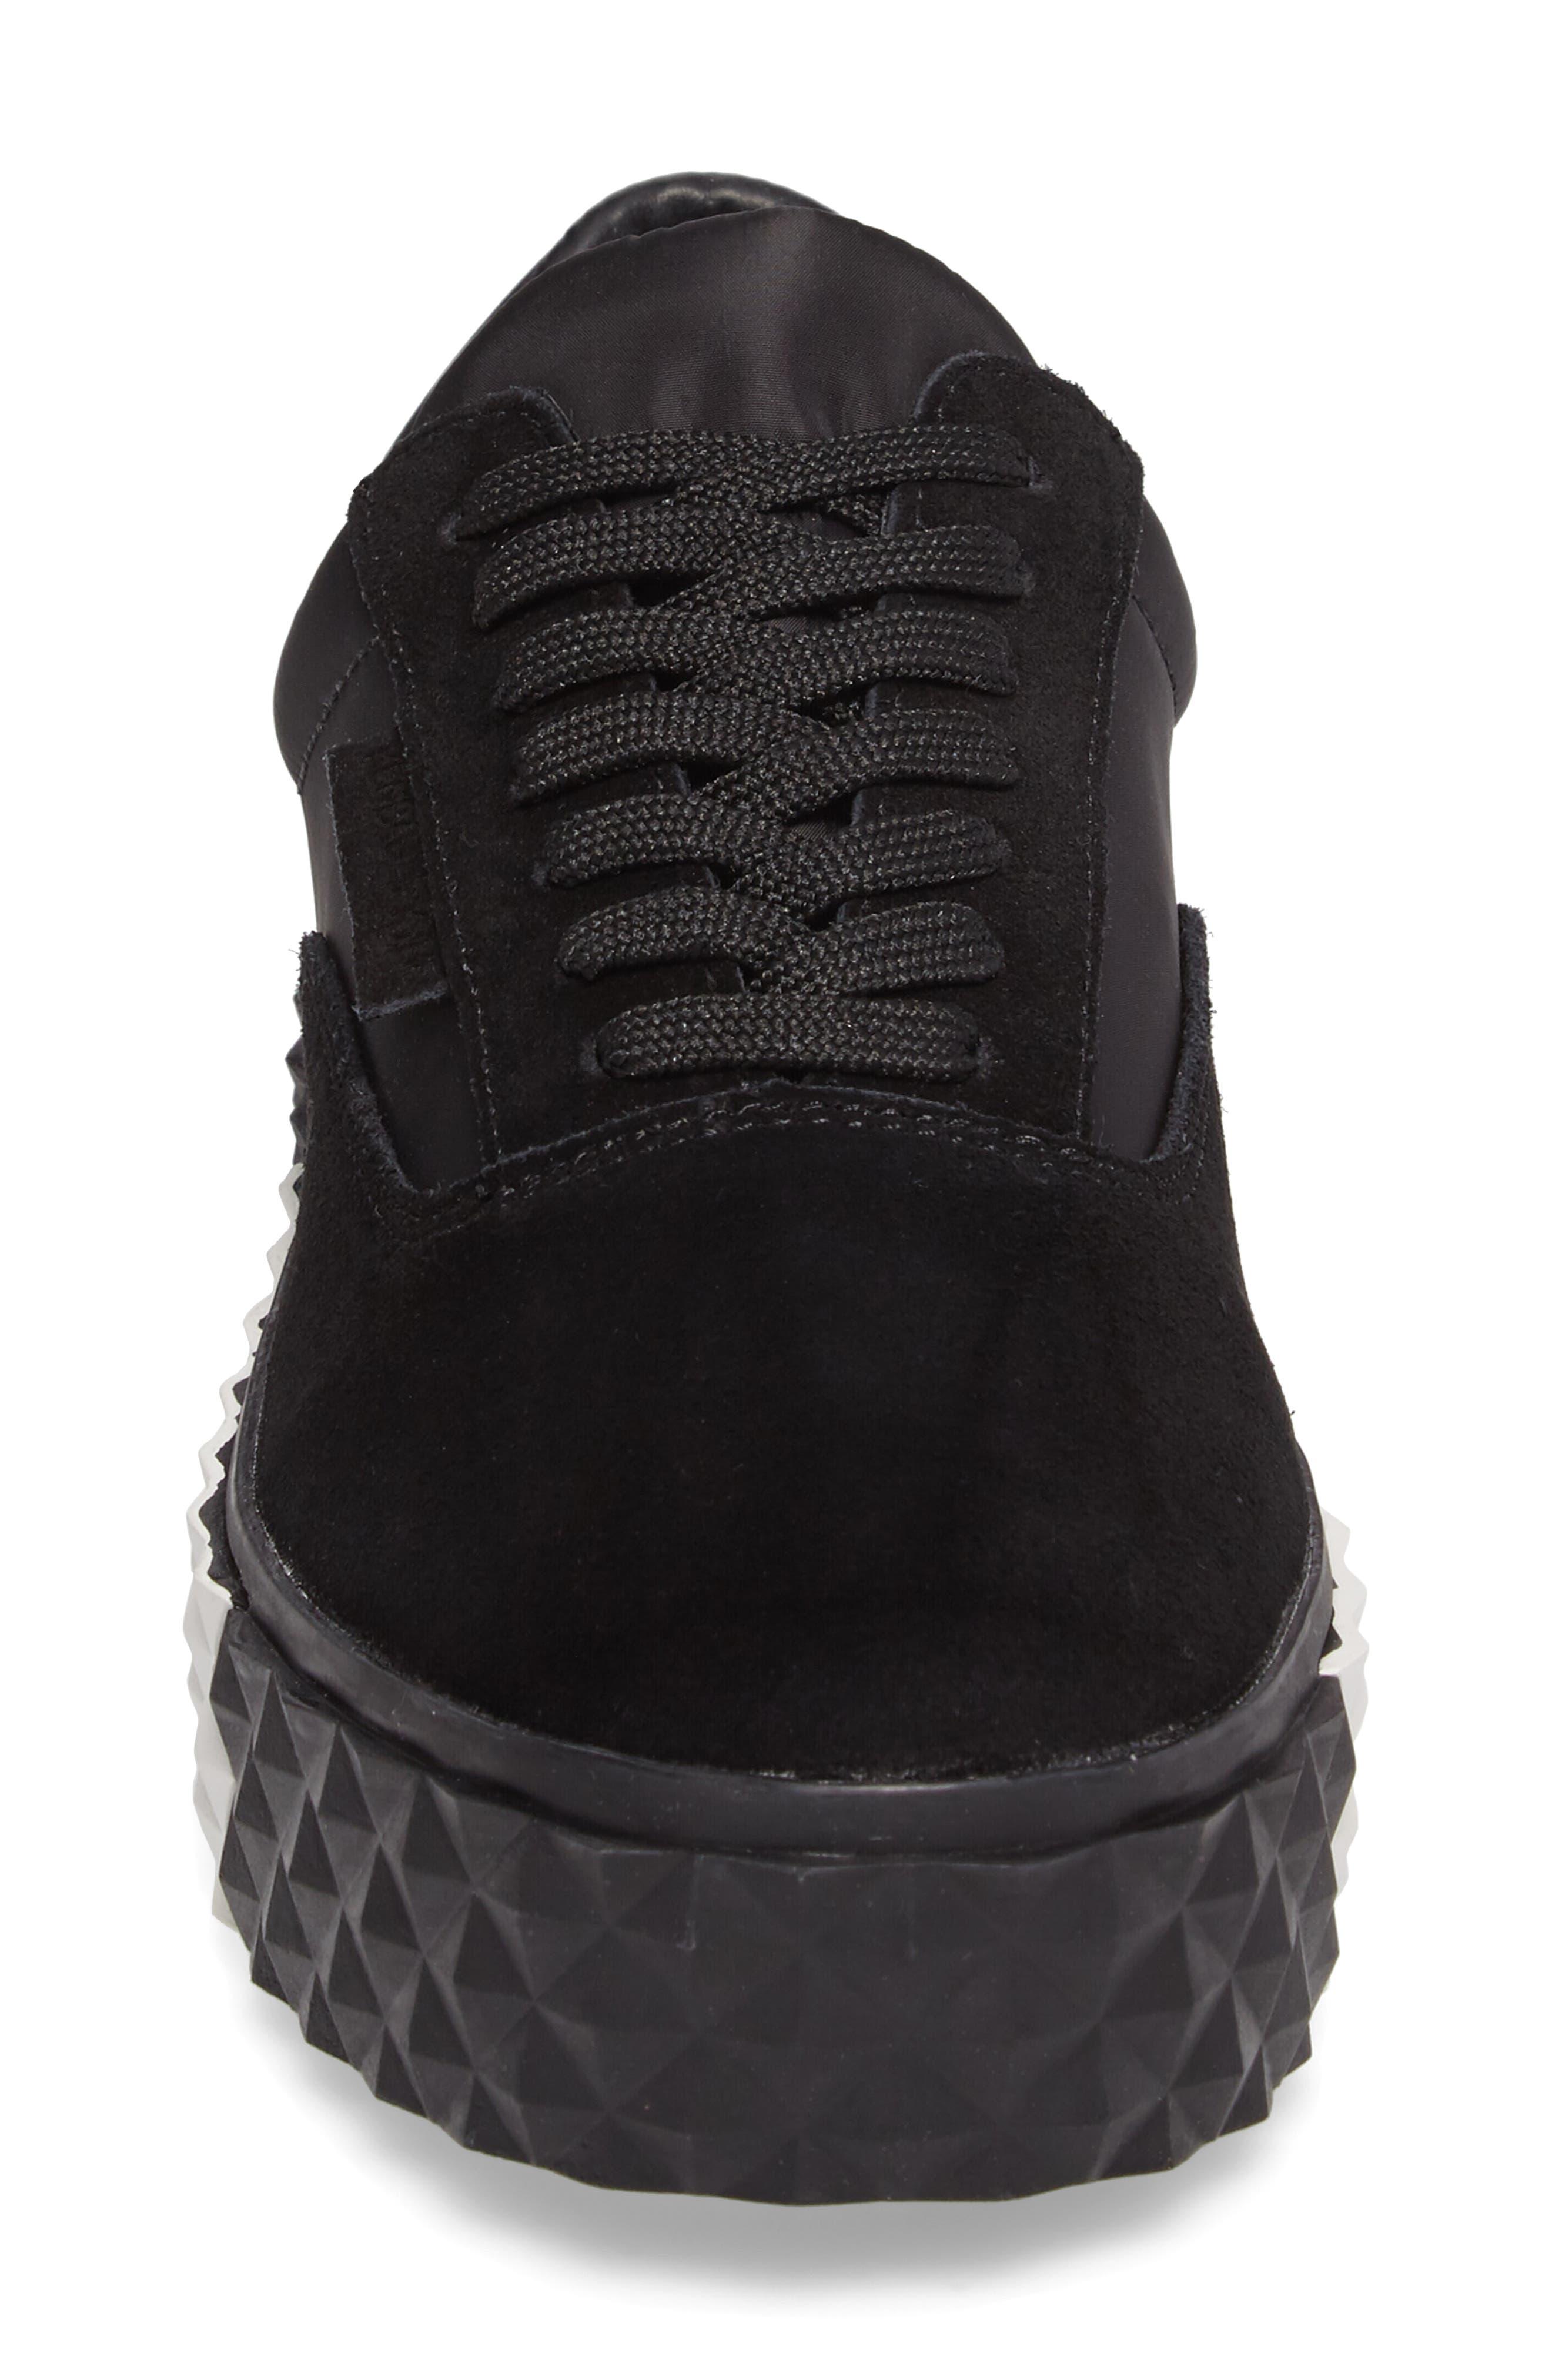 Reign Platform Sneaker,                             Alternate thumbnail 4, color,                             005